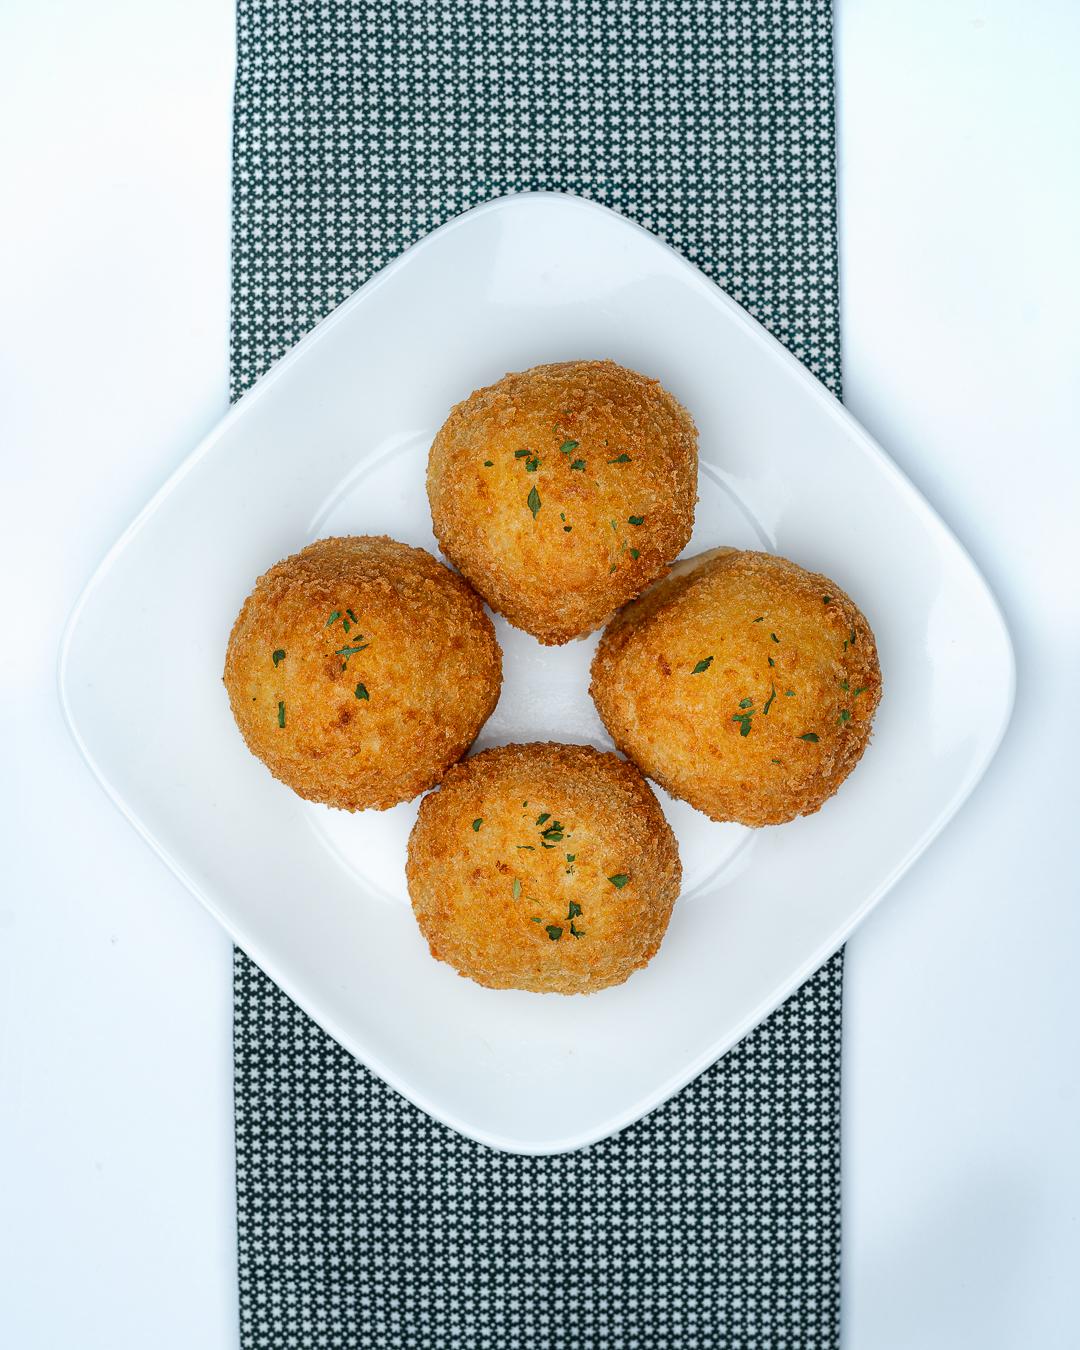 Porto_s Bakery Potato Balls-0002-Brian Suman Photography.jpg